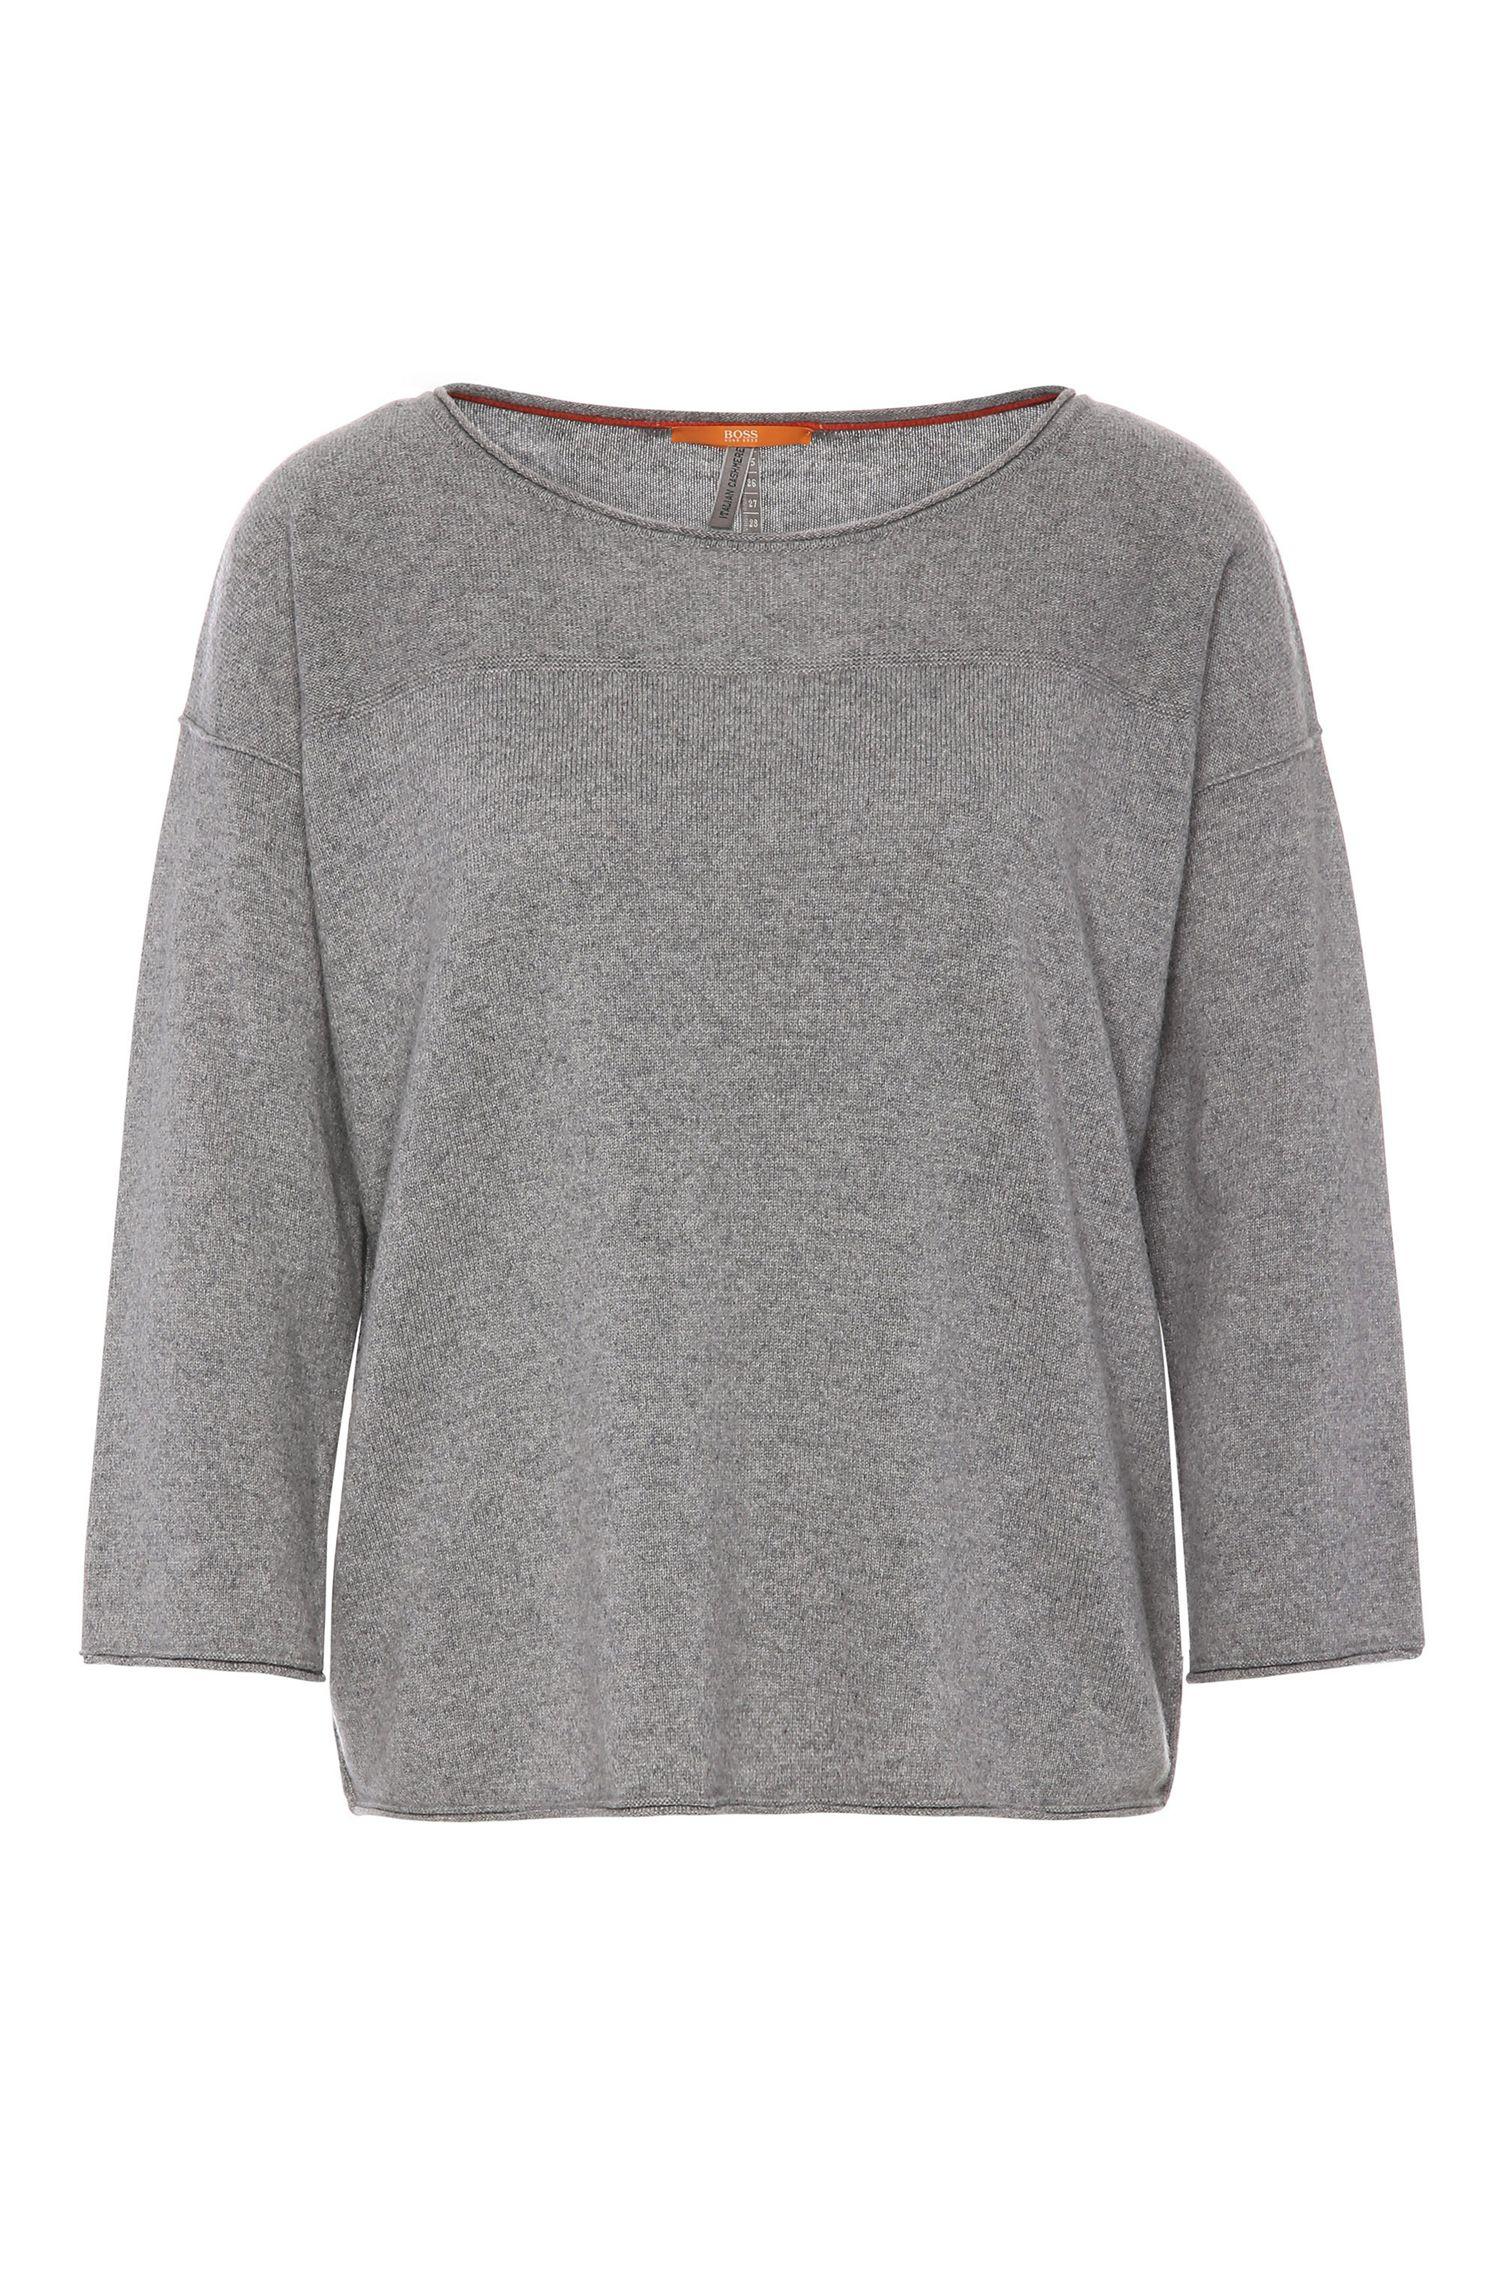 Jersey relaxed fit en mezcla de cachemira con lana: 'Wemilia'